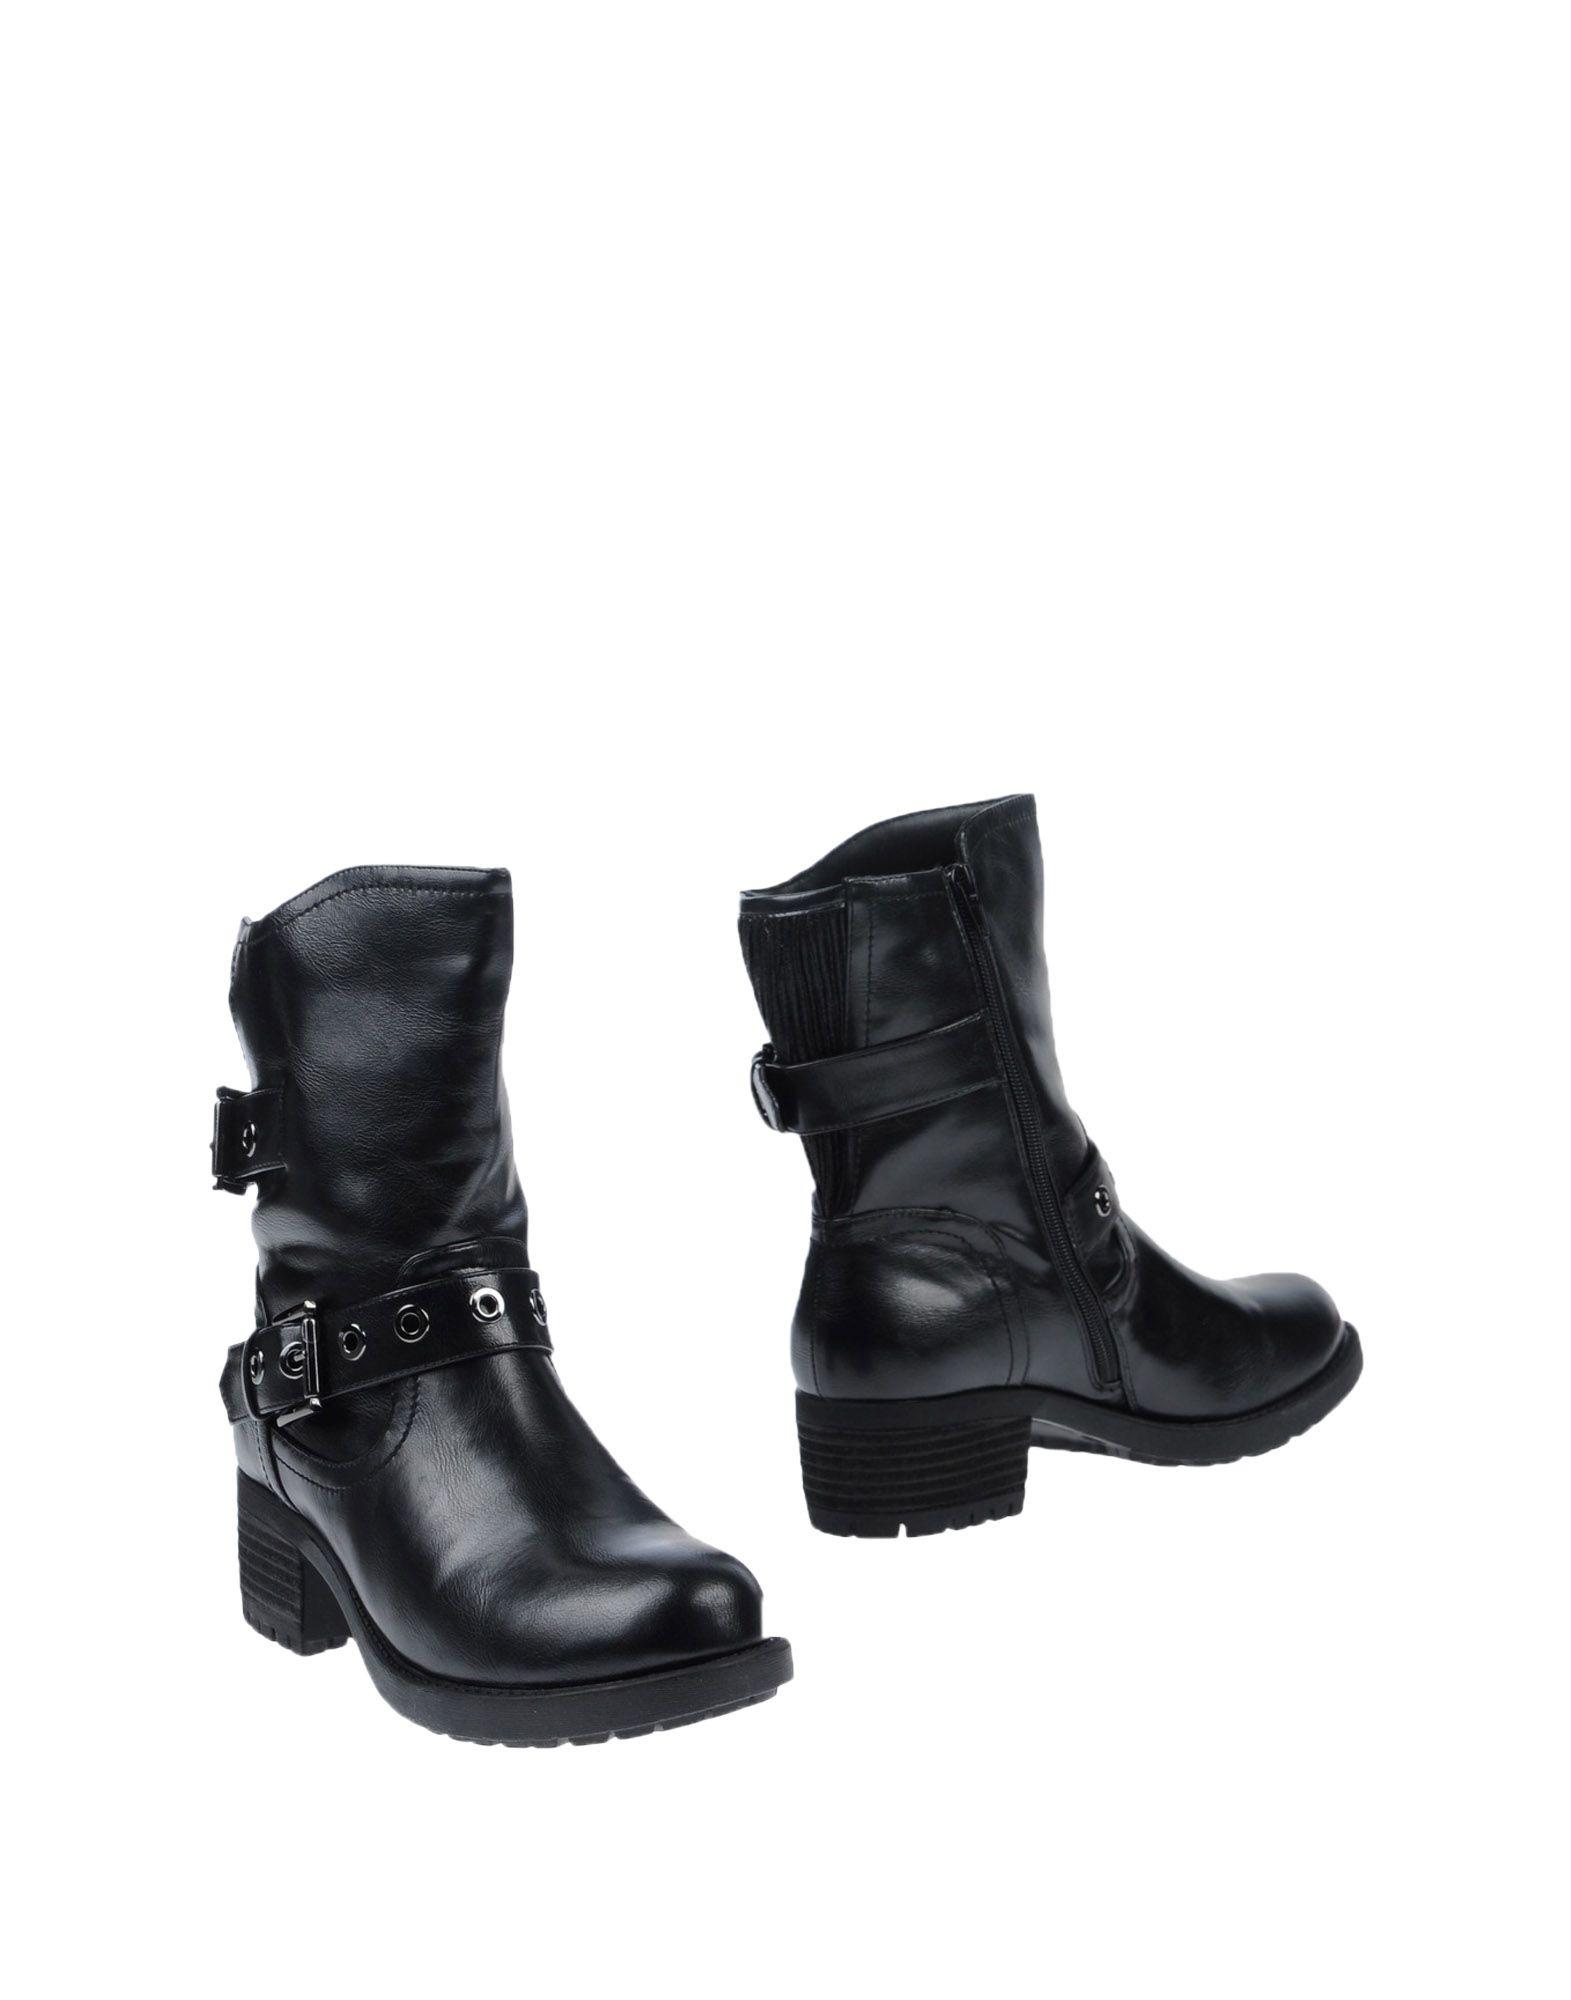 Lumberjack Stiefelette Damen  11505702BX Gute Qualität beliebte Schuhe